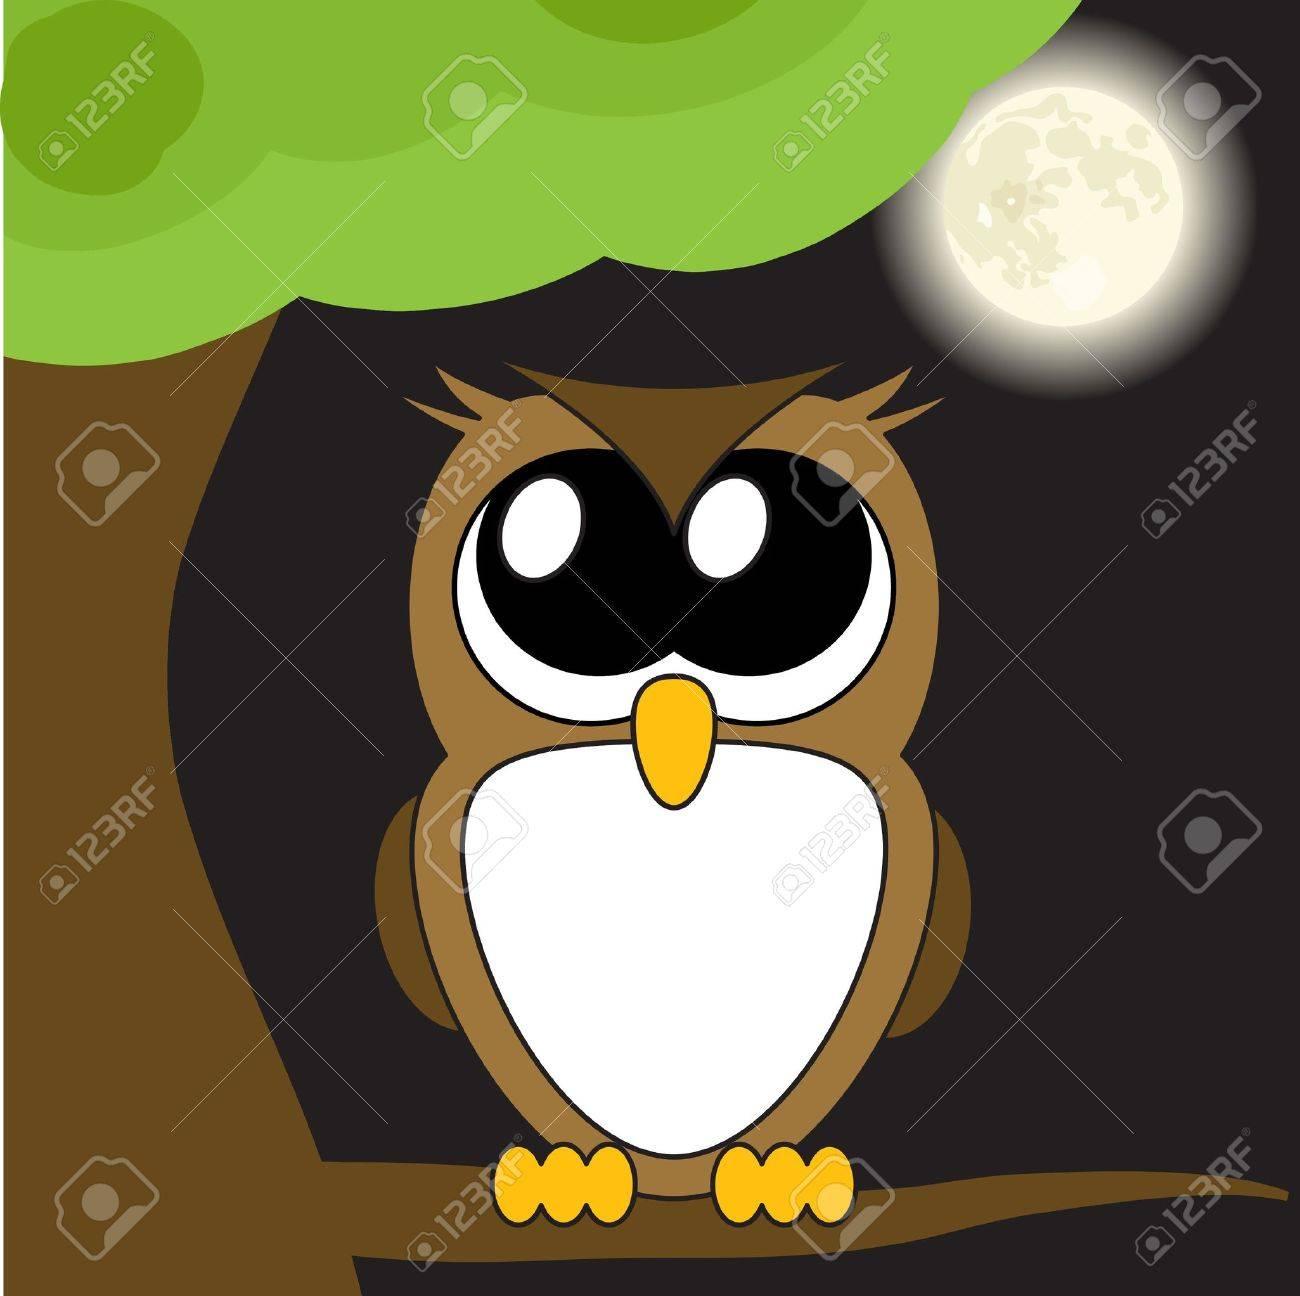 Very cute cartoon owl with big eyes, - 12233002